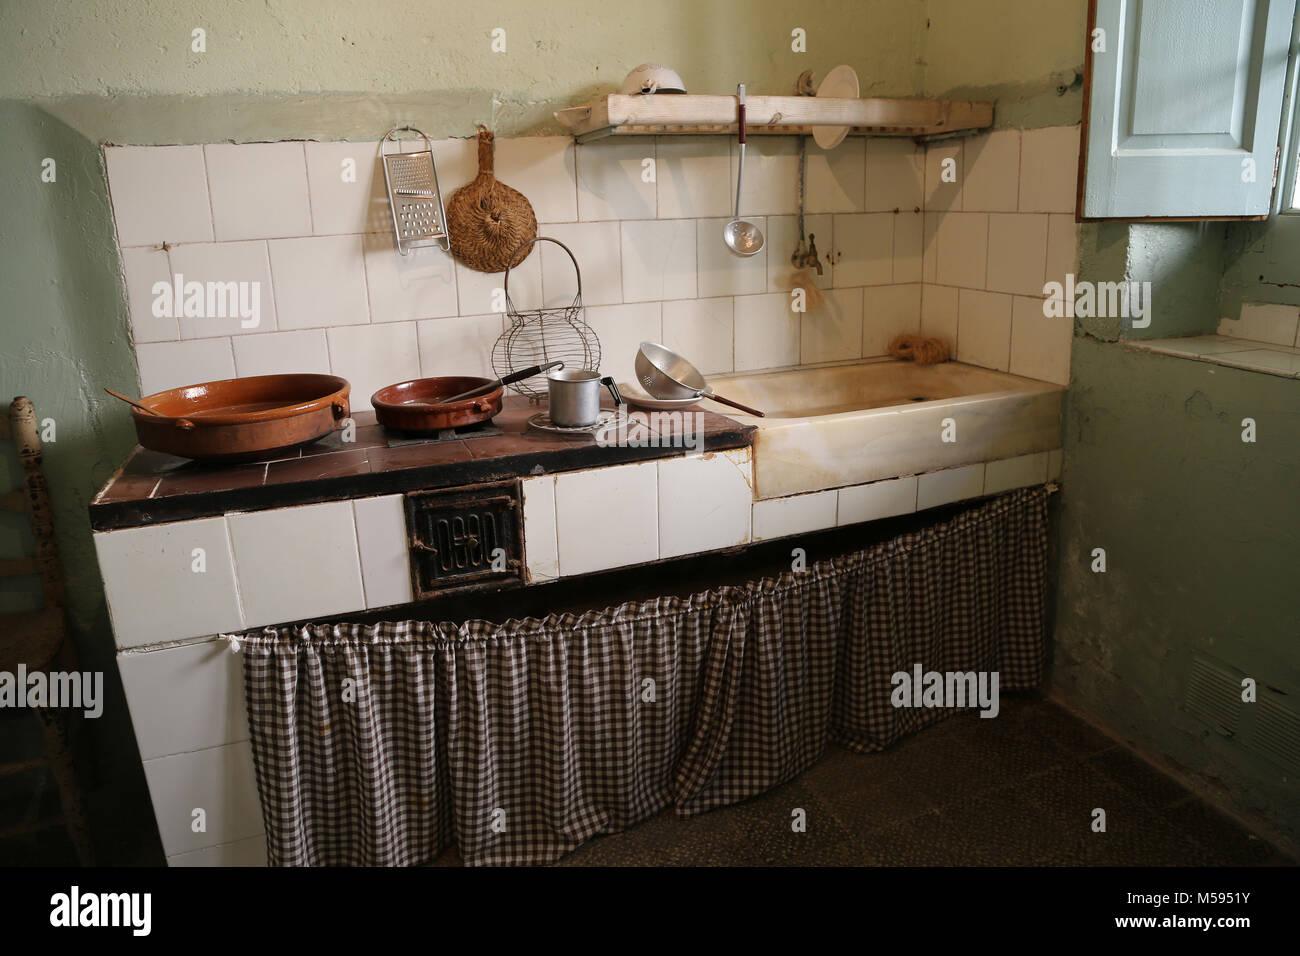 20th Century Housing Stockfotos & 20th Century Housing Bilder - Alamy